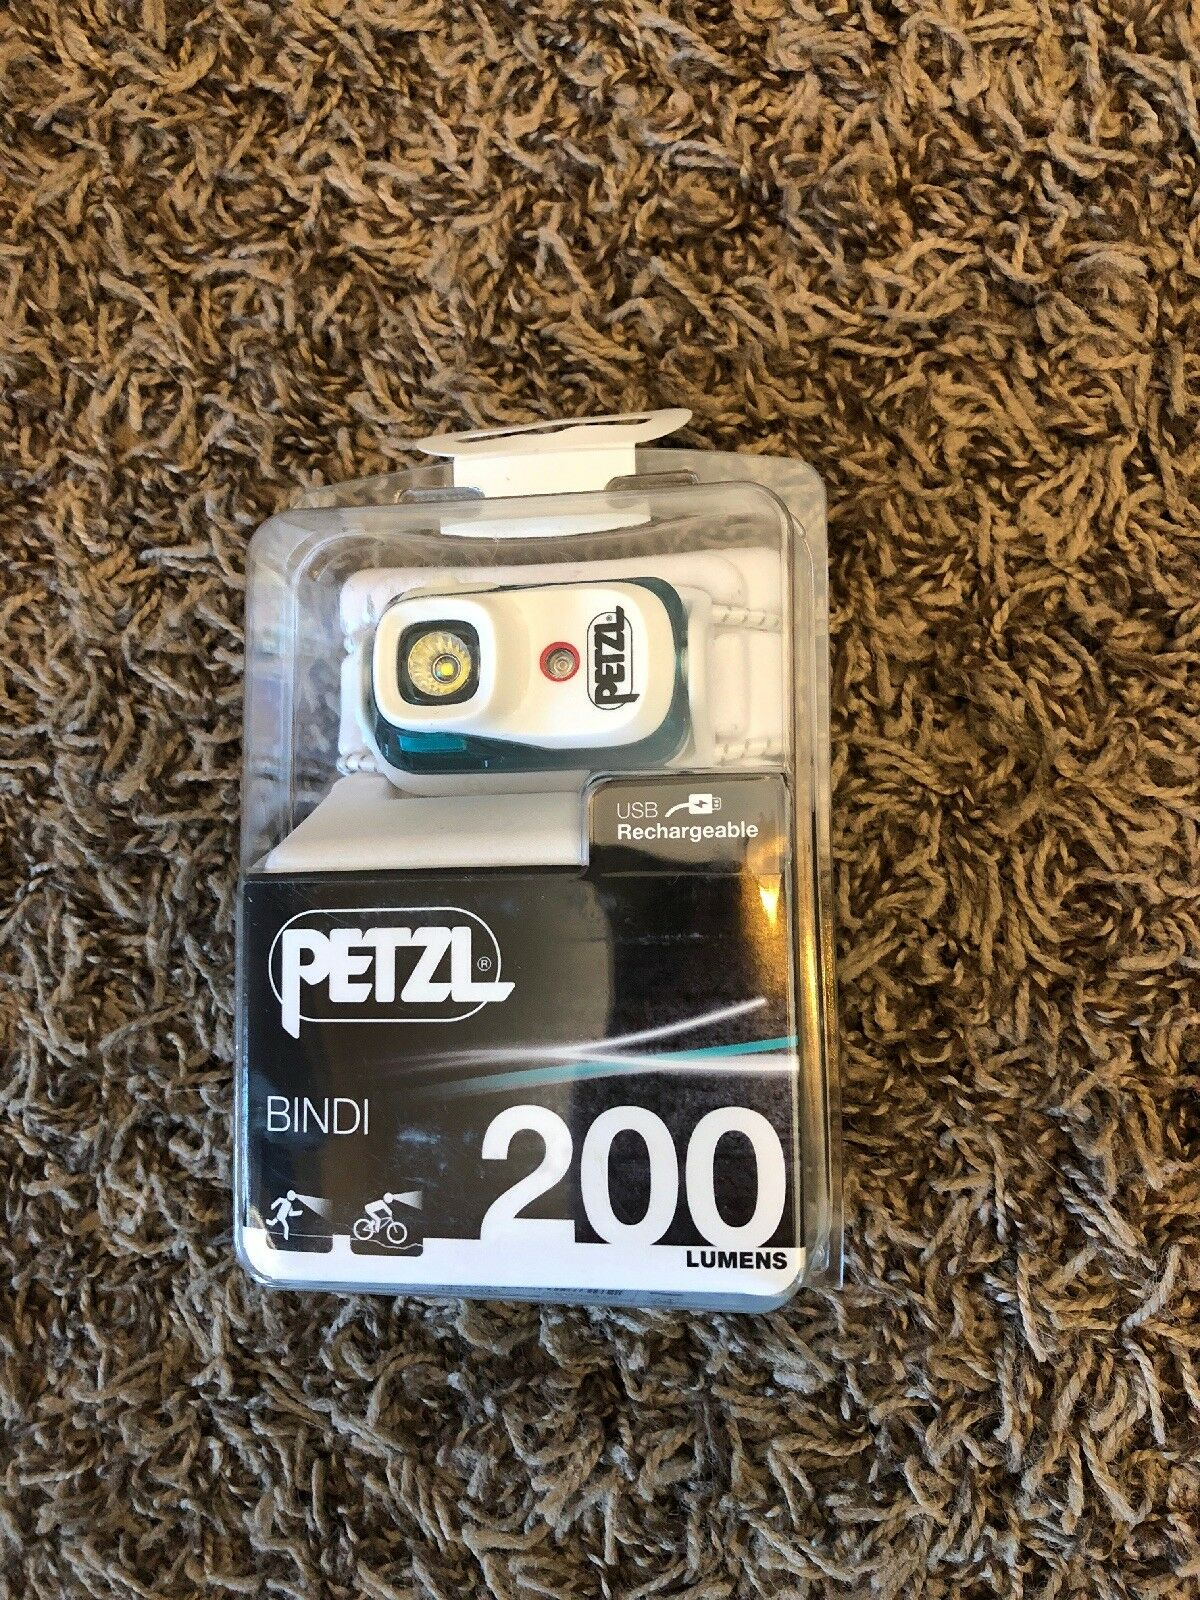 Petzl Bindi Active Headlamp 200 Lumens bluee USB Rechargeable Brand New